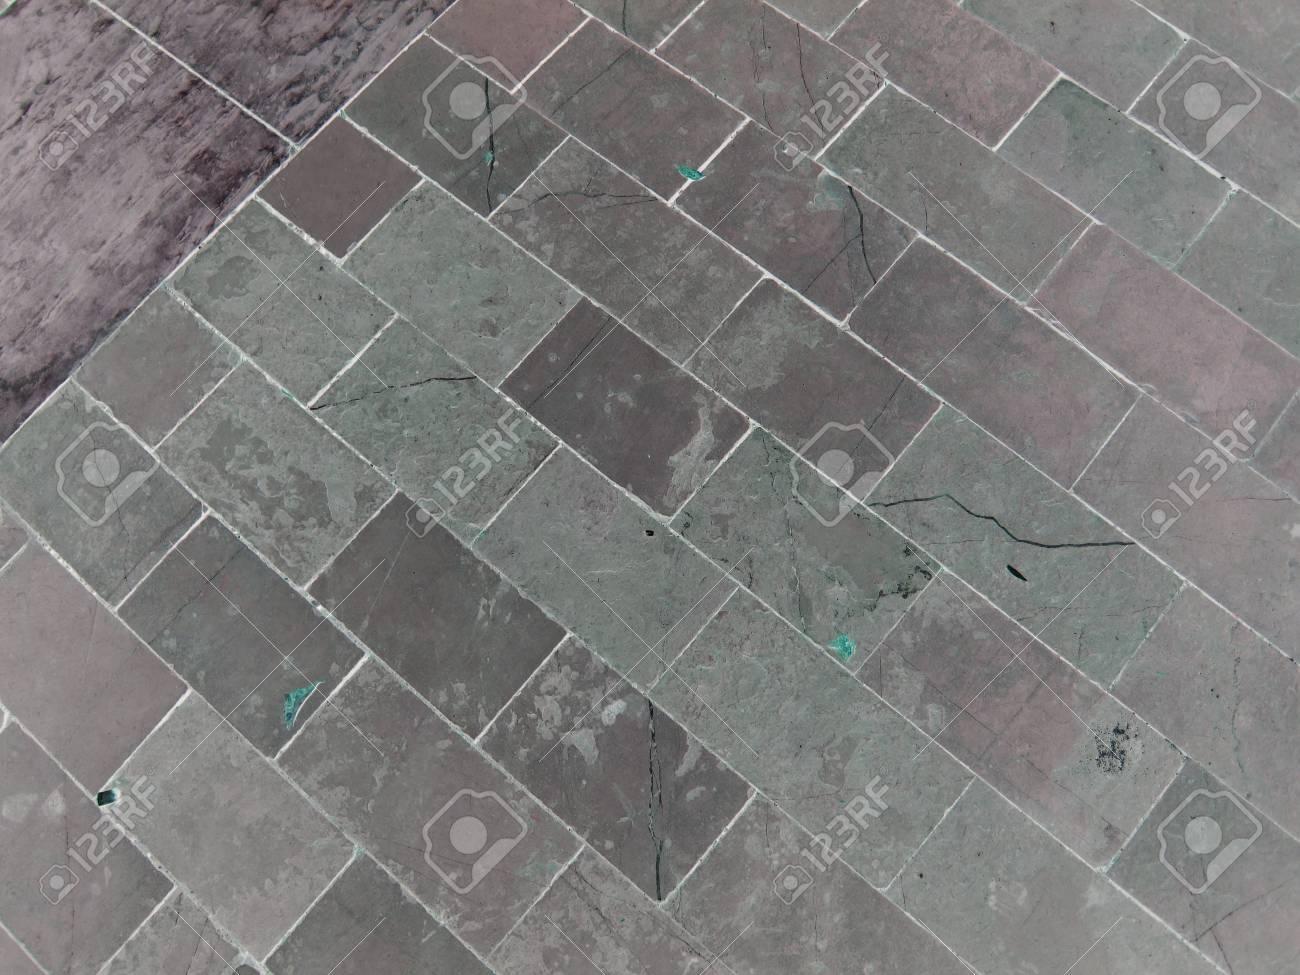 Paving brick walkway  The pattern of stone block paving